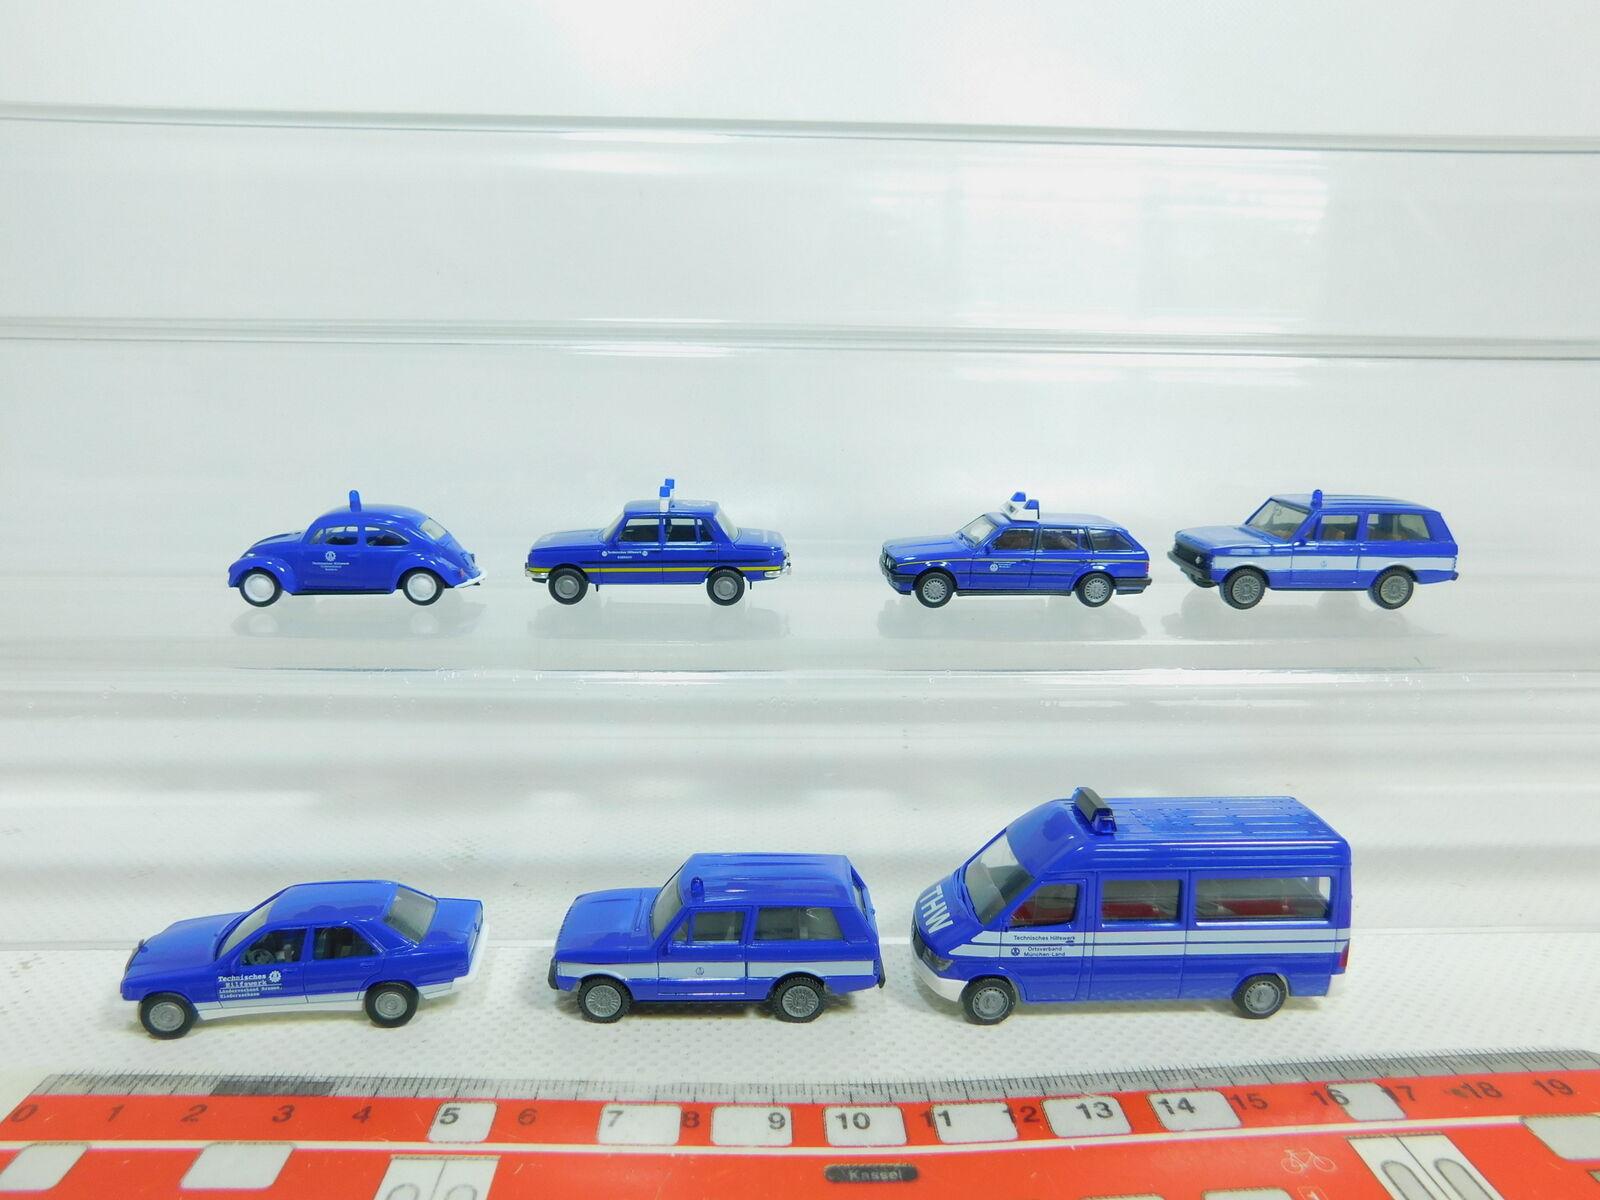 Bn140-0, 5  7x Herpa h0 1 87 87 87 THW-modelo  VW Escarabajo bmw + + MB + Wartburg etc, S.G. a91ffd